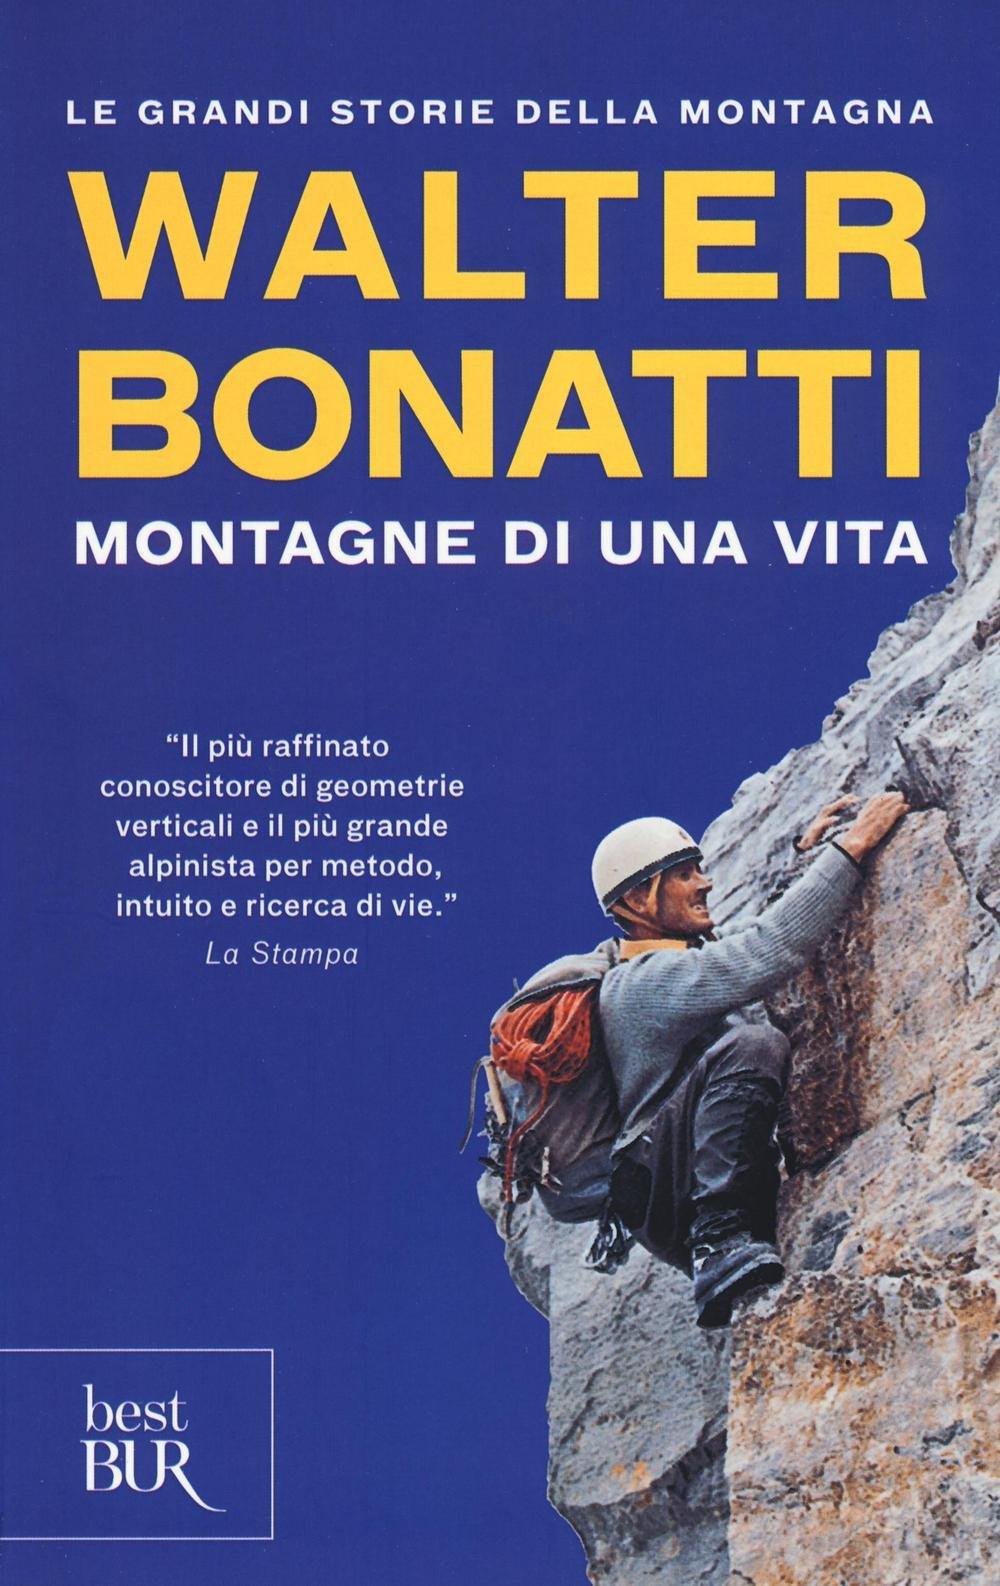 Walter Bonatti 1 (Mediterranean Citizens Story).jpg